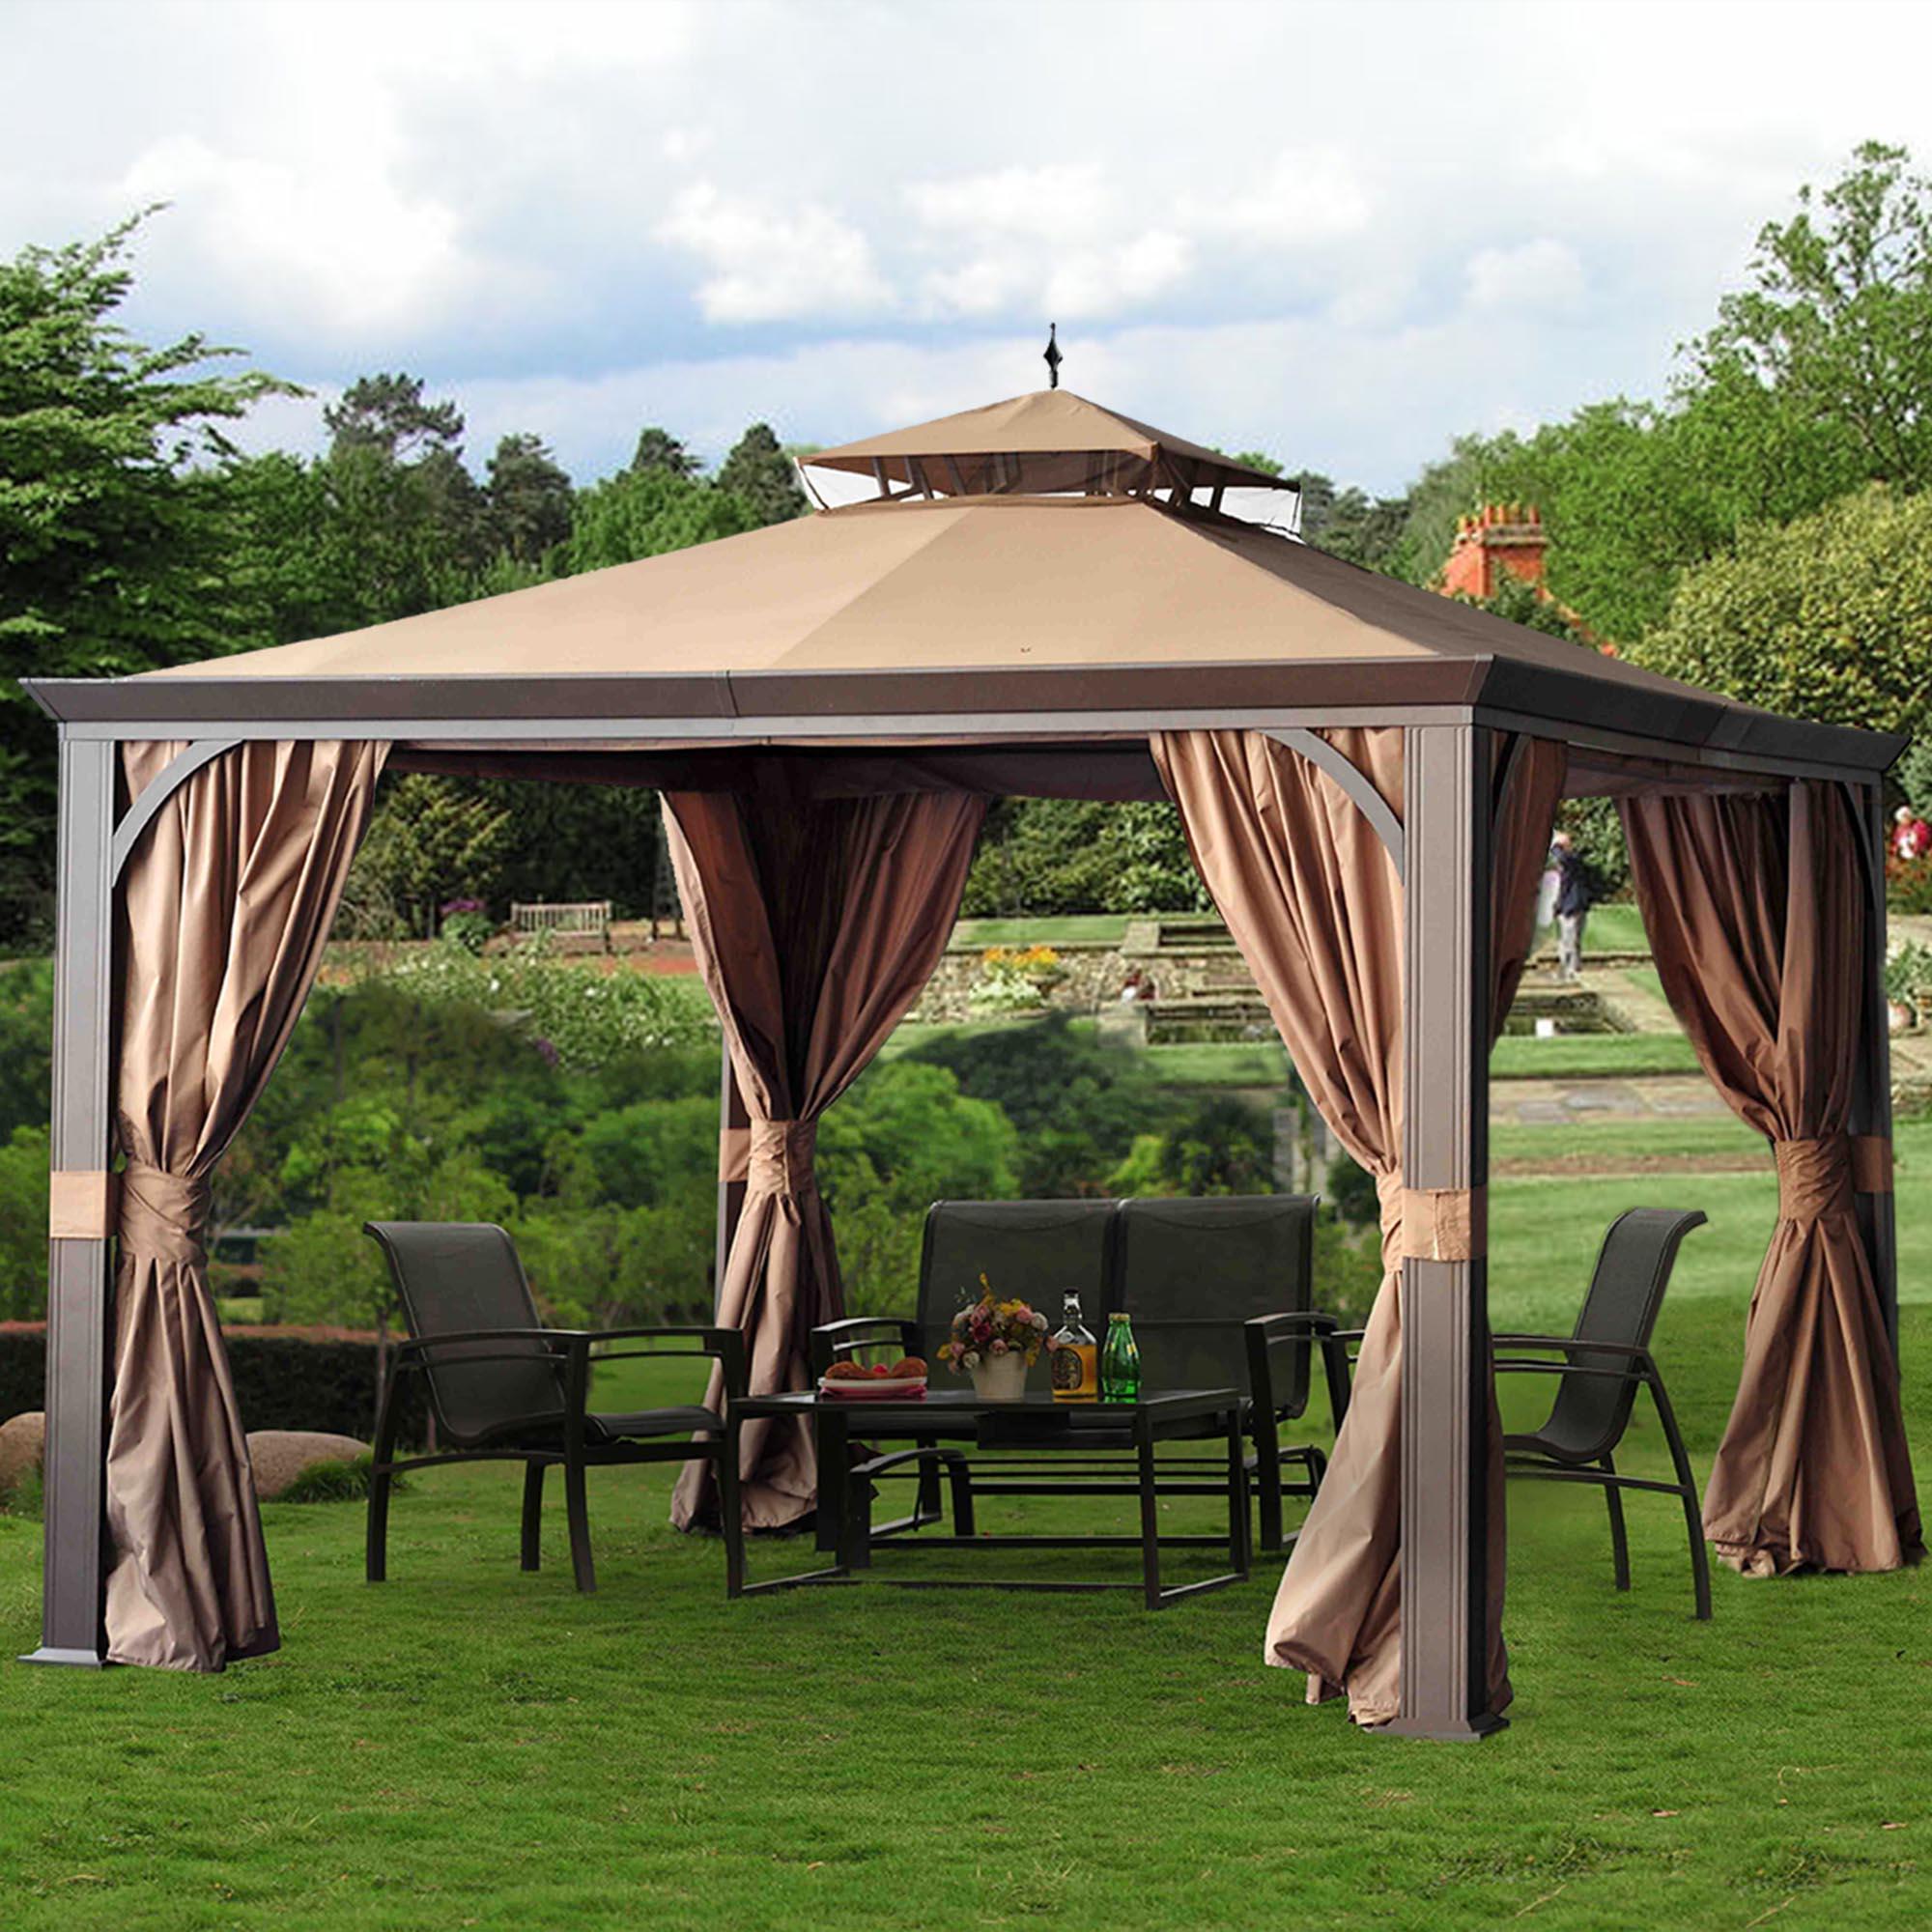 Sunjoy Montgomery 10' X 12' Gazebo - Outdoor Living Gazebos Canopies & Pergolas